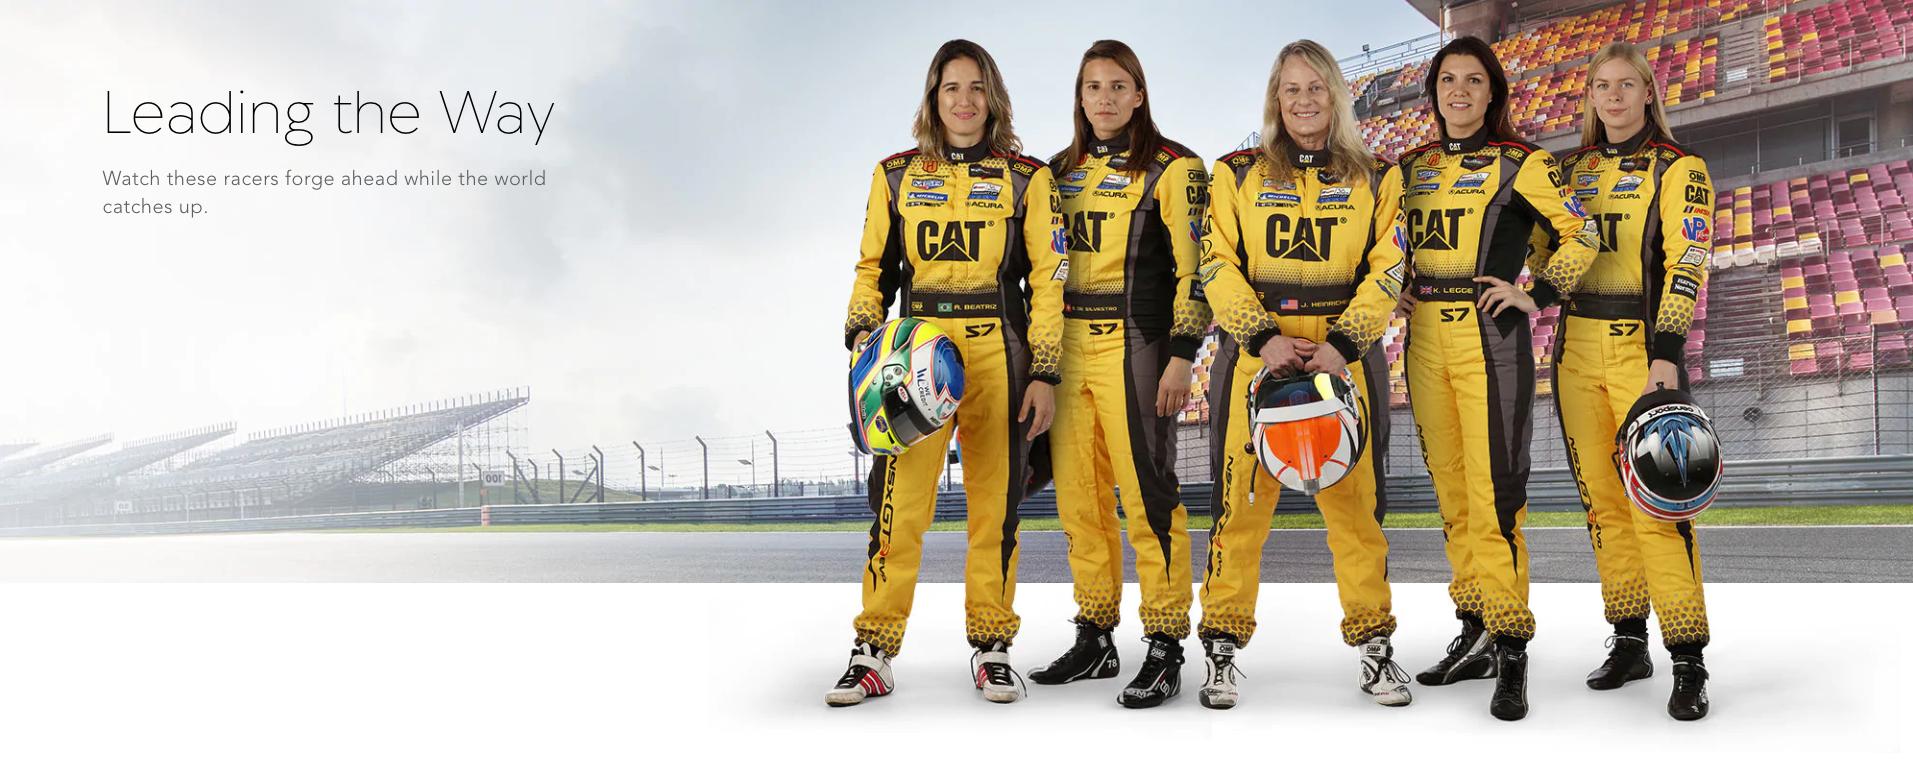 Acura Motorsport _ Female Race Car Drivers _ Acura com (6).png